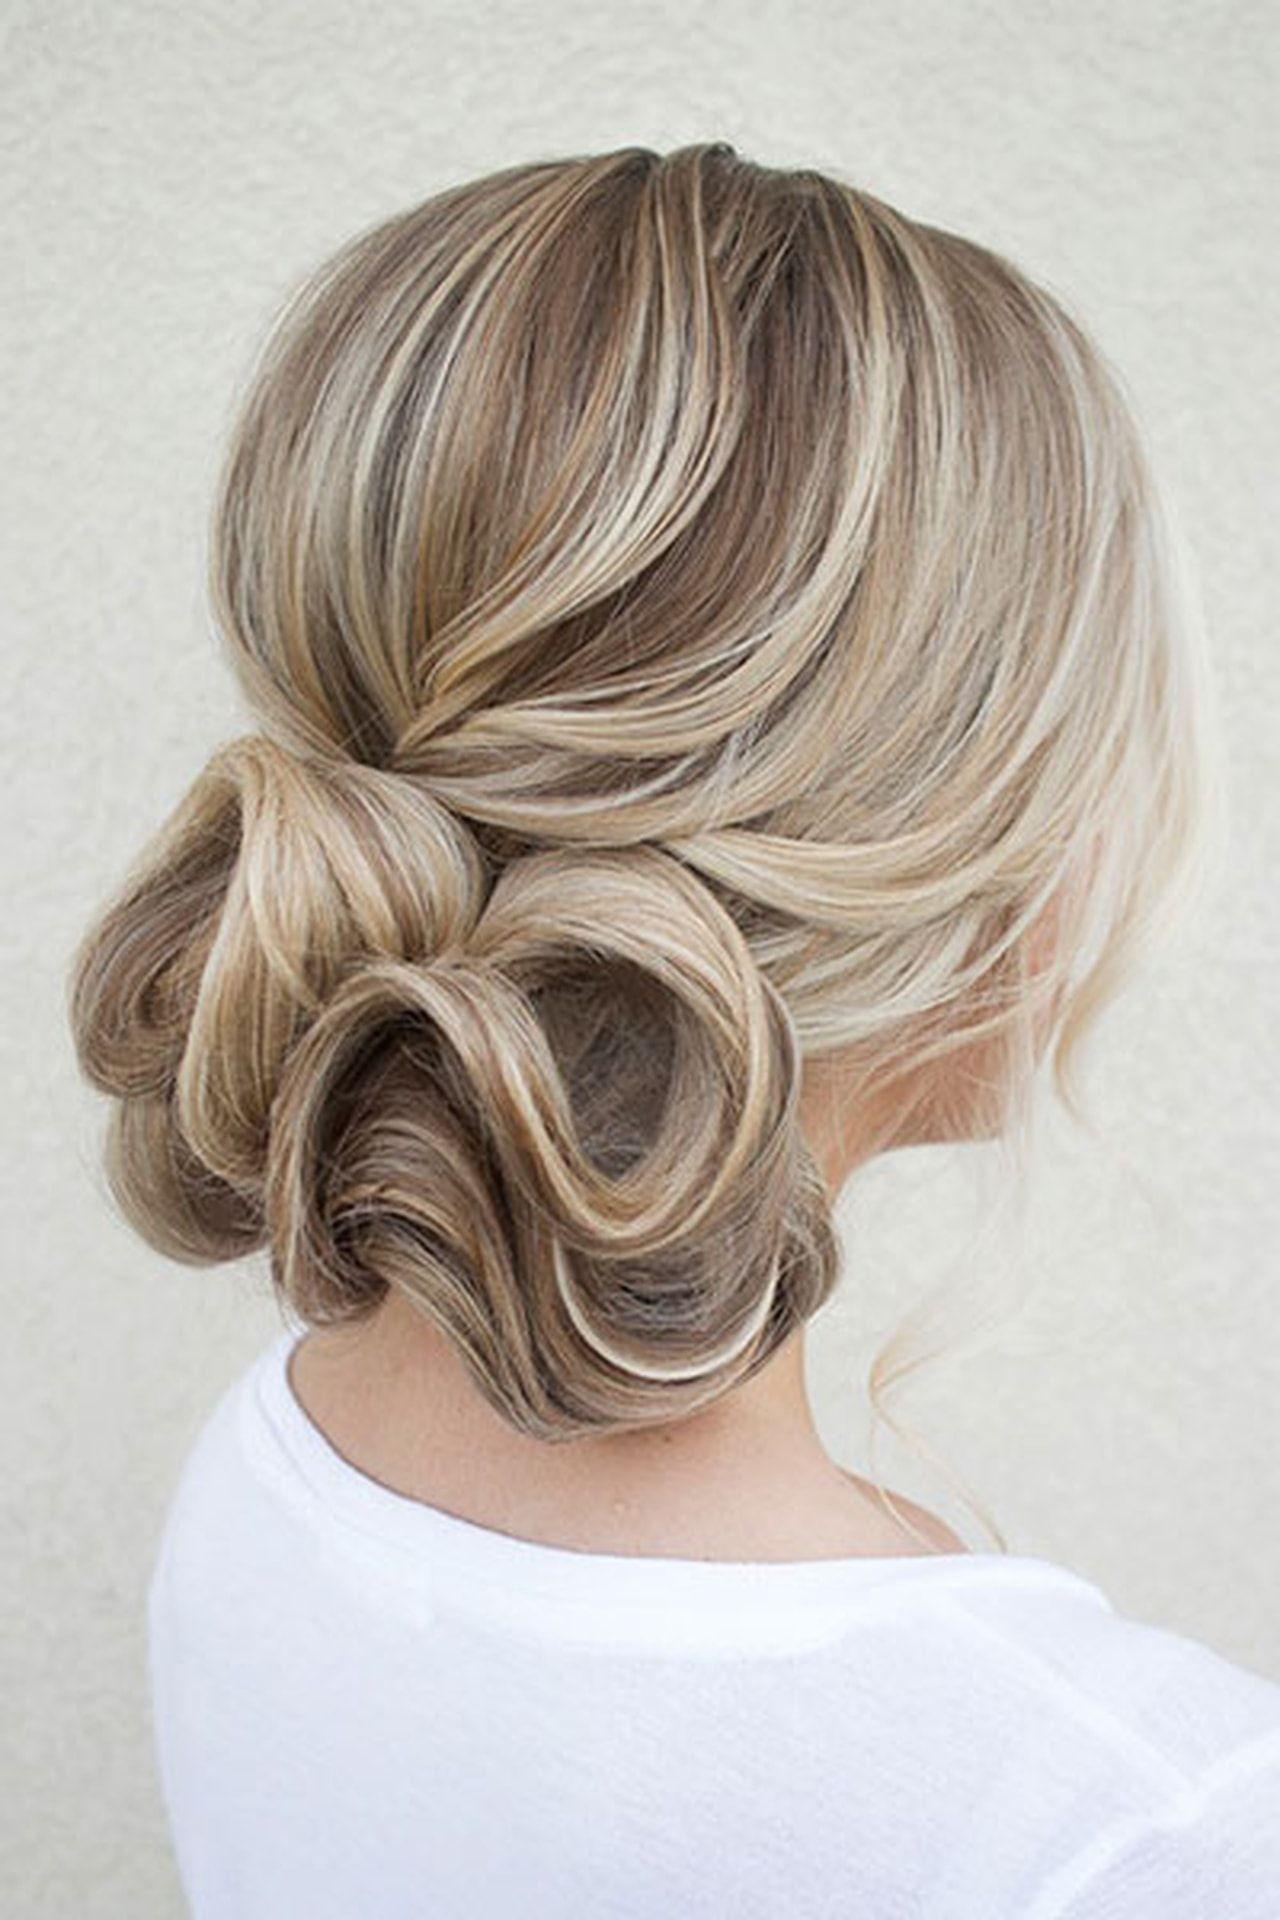 صور تسريحات شعر من الخلف موسوعة Long Hair Styles Cute Hairstyles For Medium Hair Hair Styles